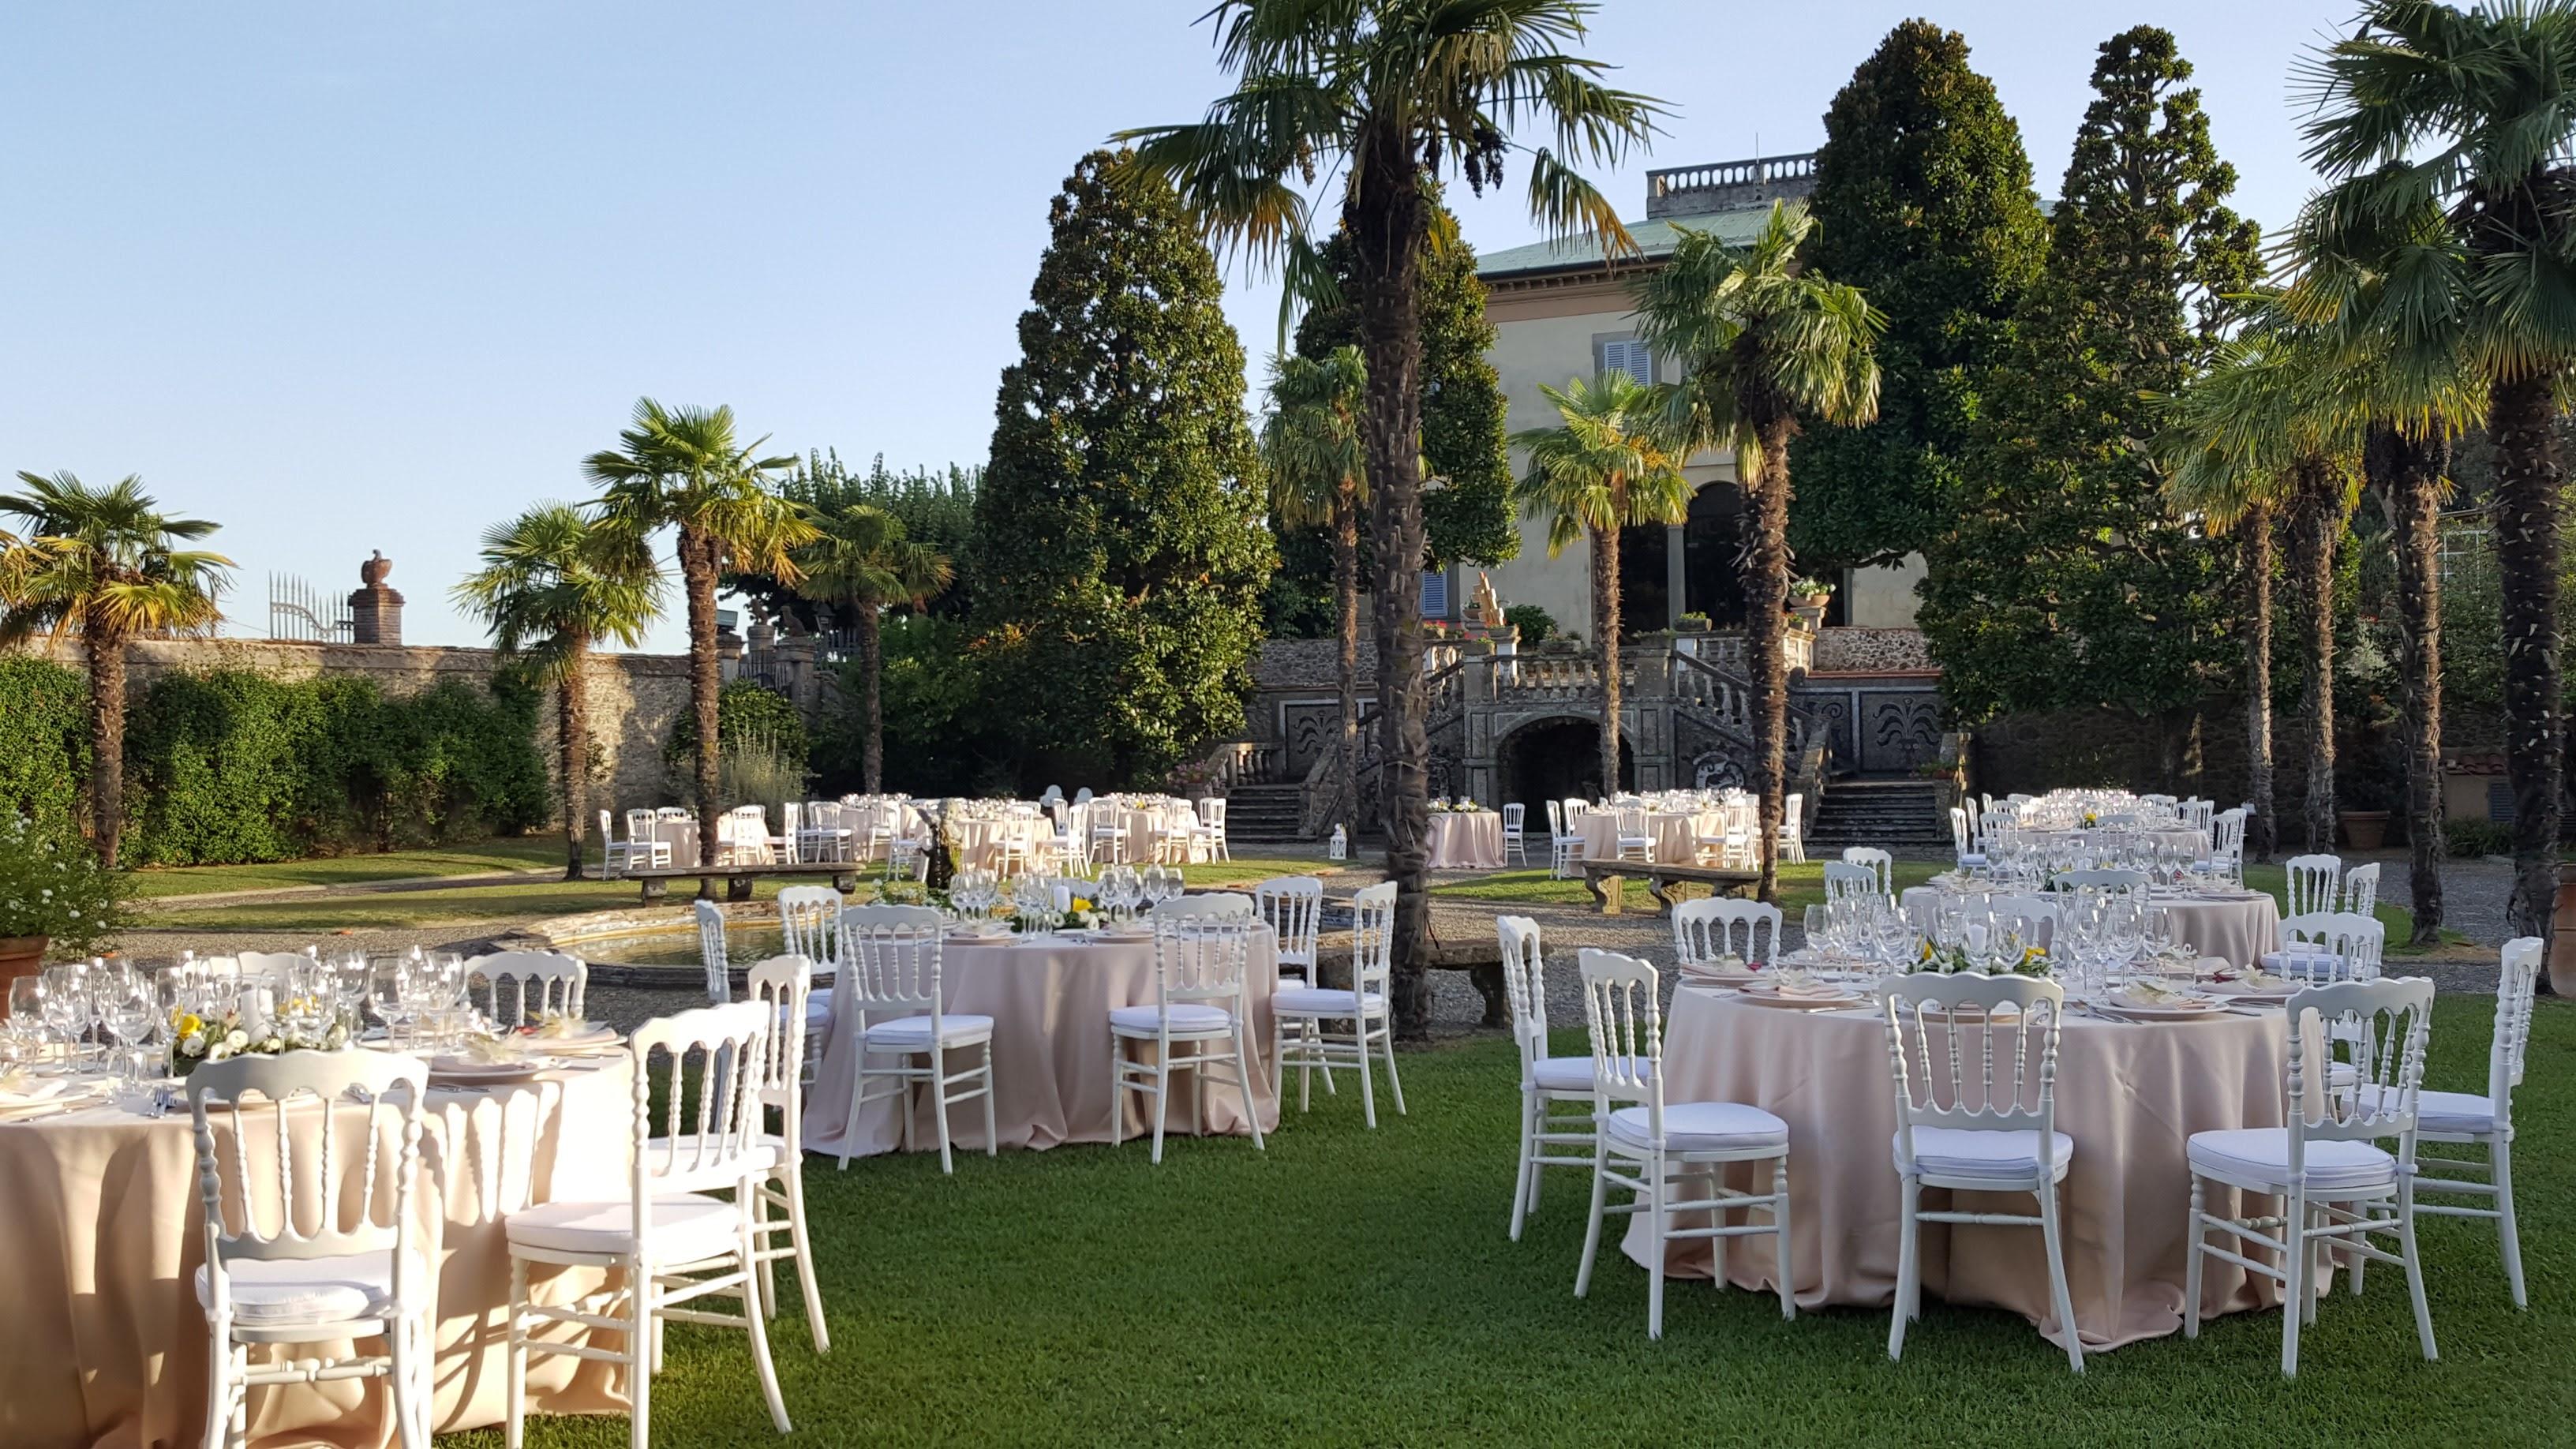 Matrimonio Filippo ed Eleonora 26 Agosto 2017